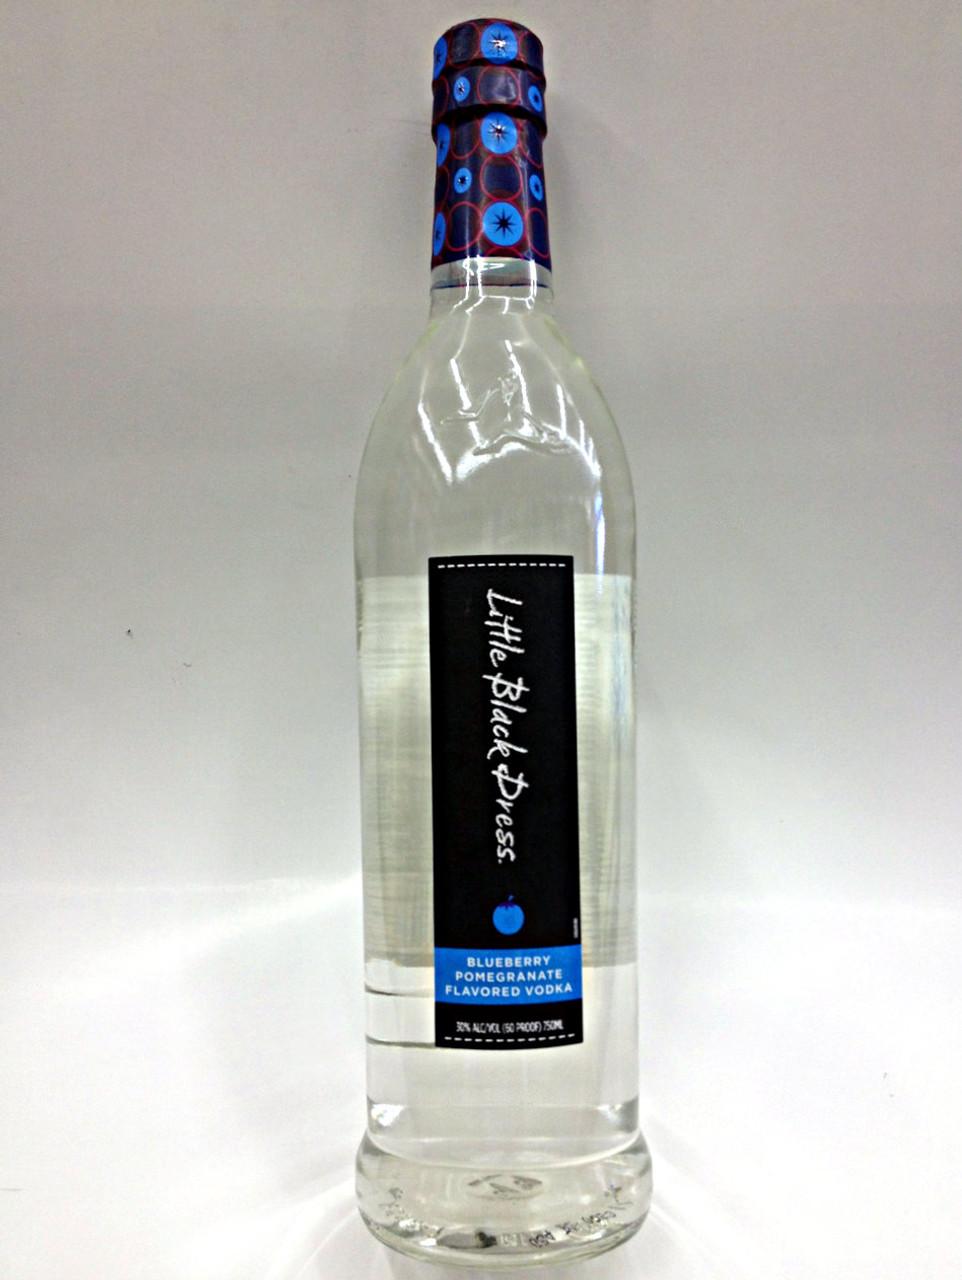 Little Black Dress Blueberry Pomegranate Flavored Vodka